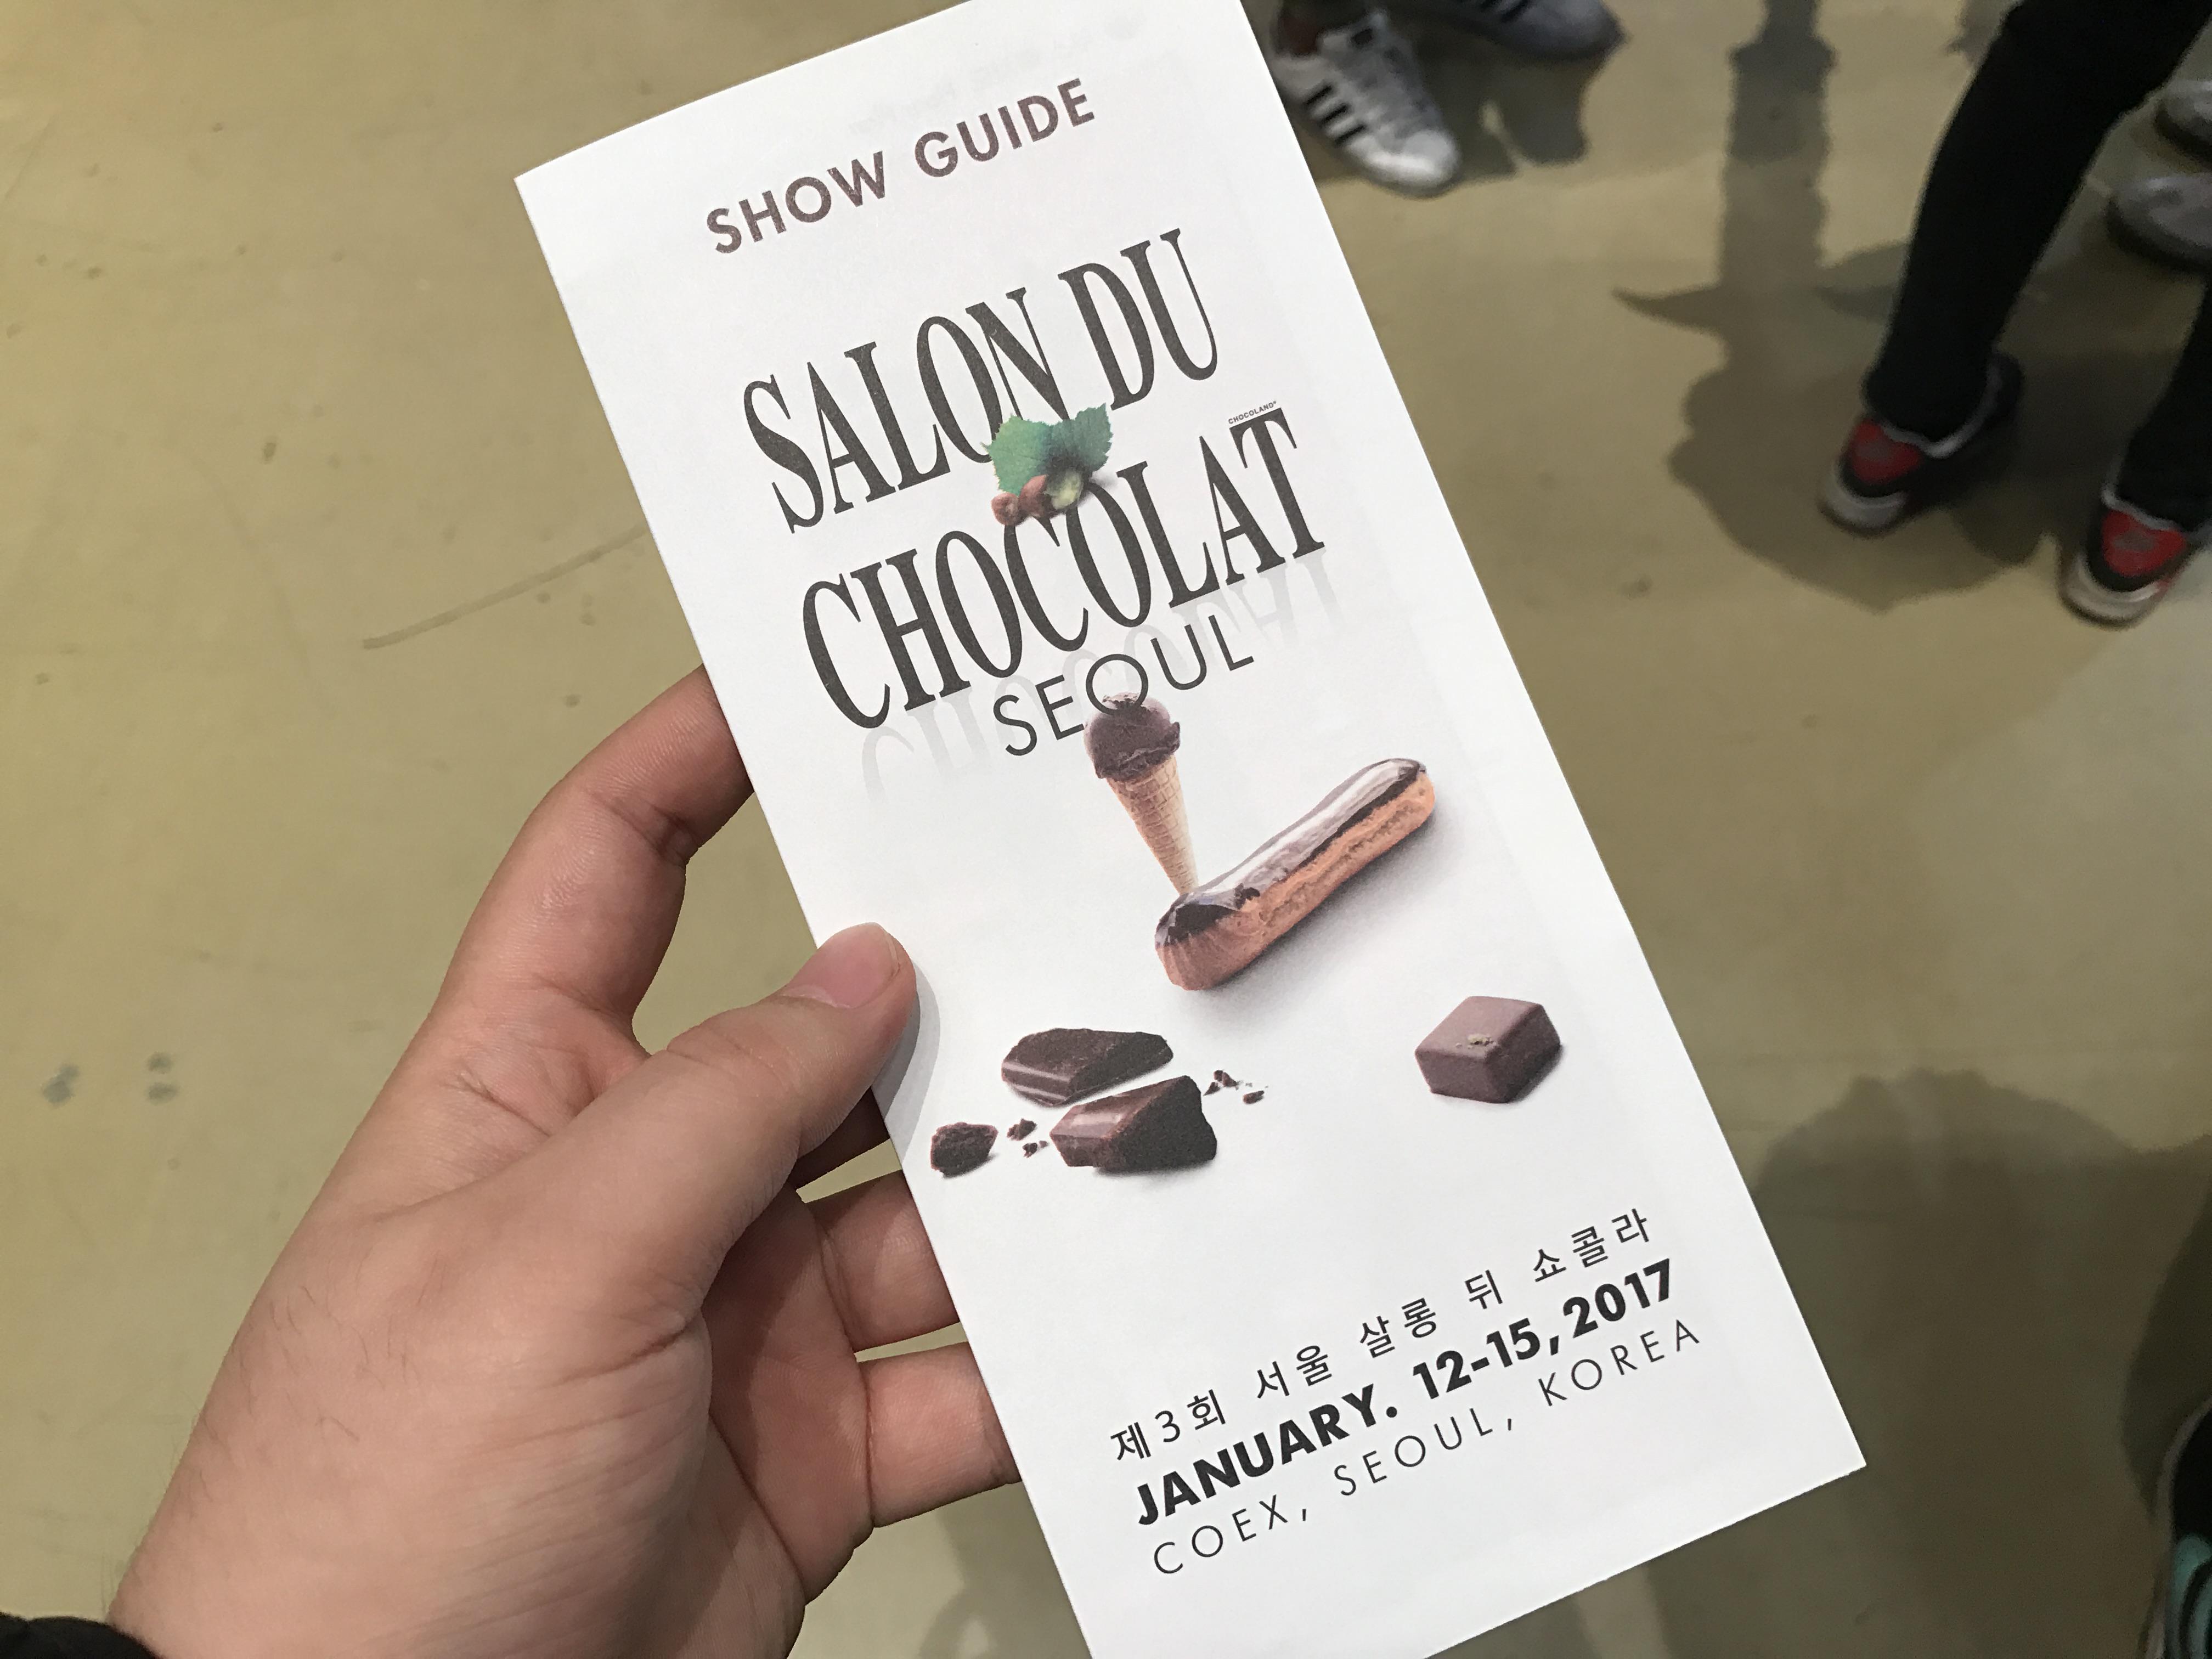 SALON DU CHOCOLAT SEOUL 행사에 처음 가..